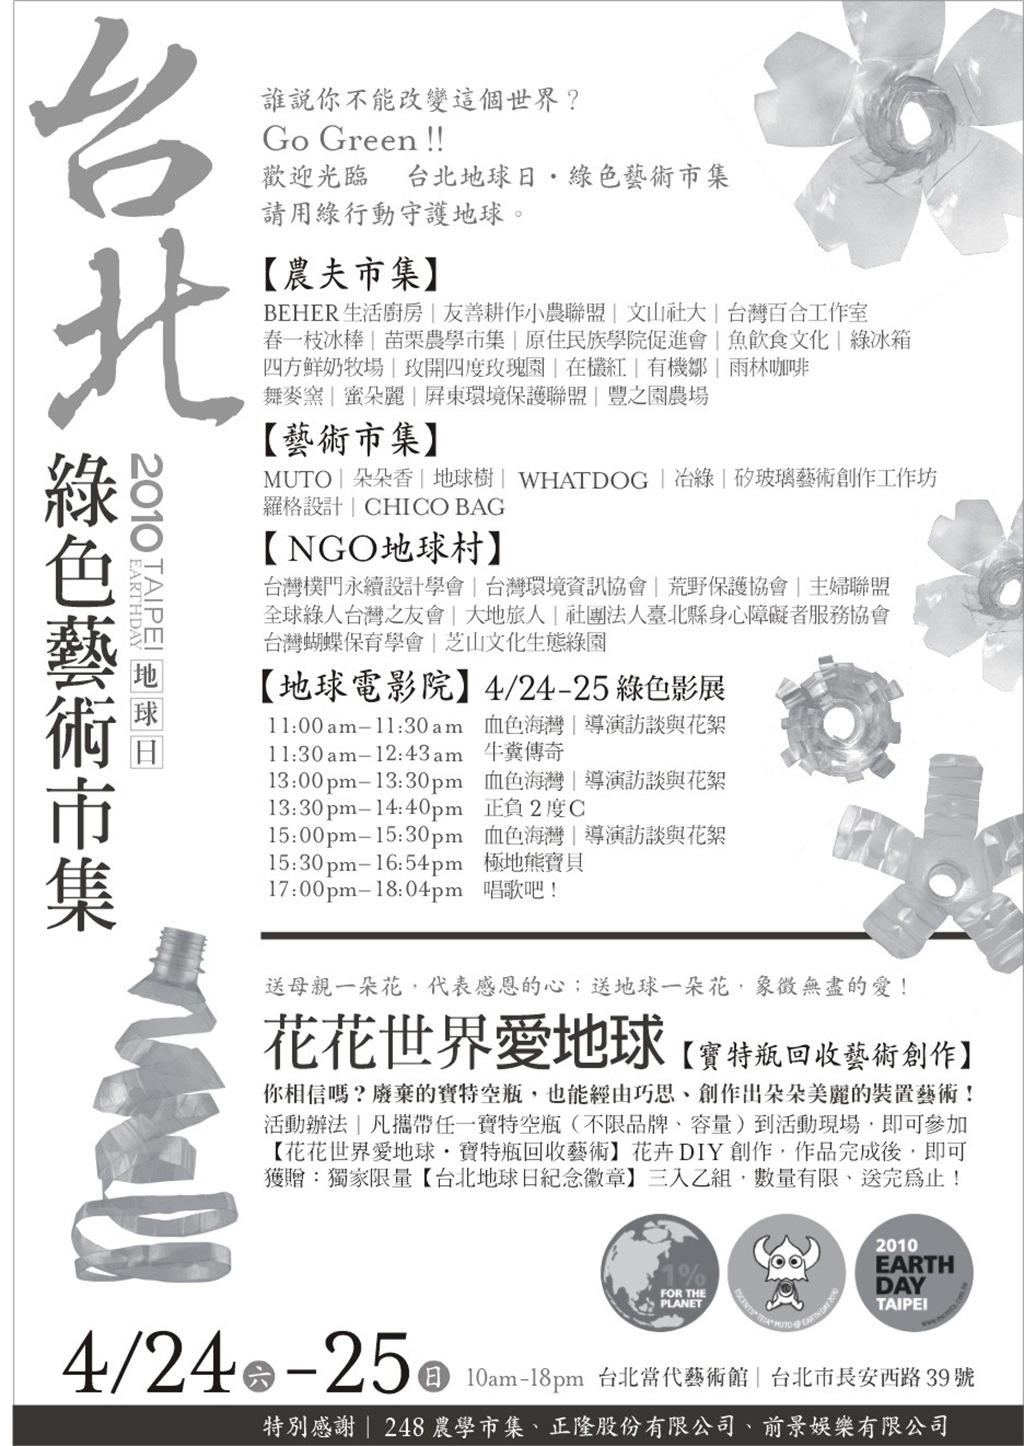 t2010-台北地球日明信片(反)t